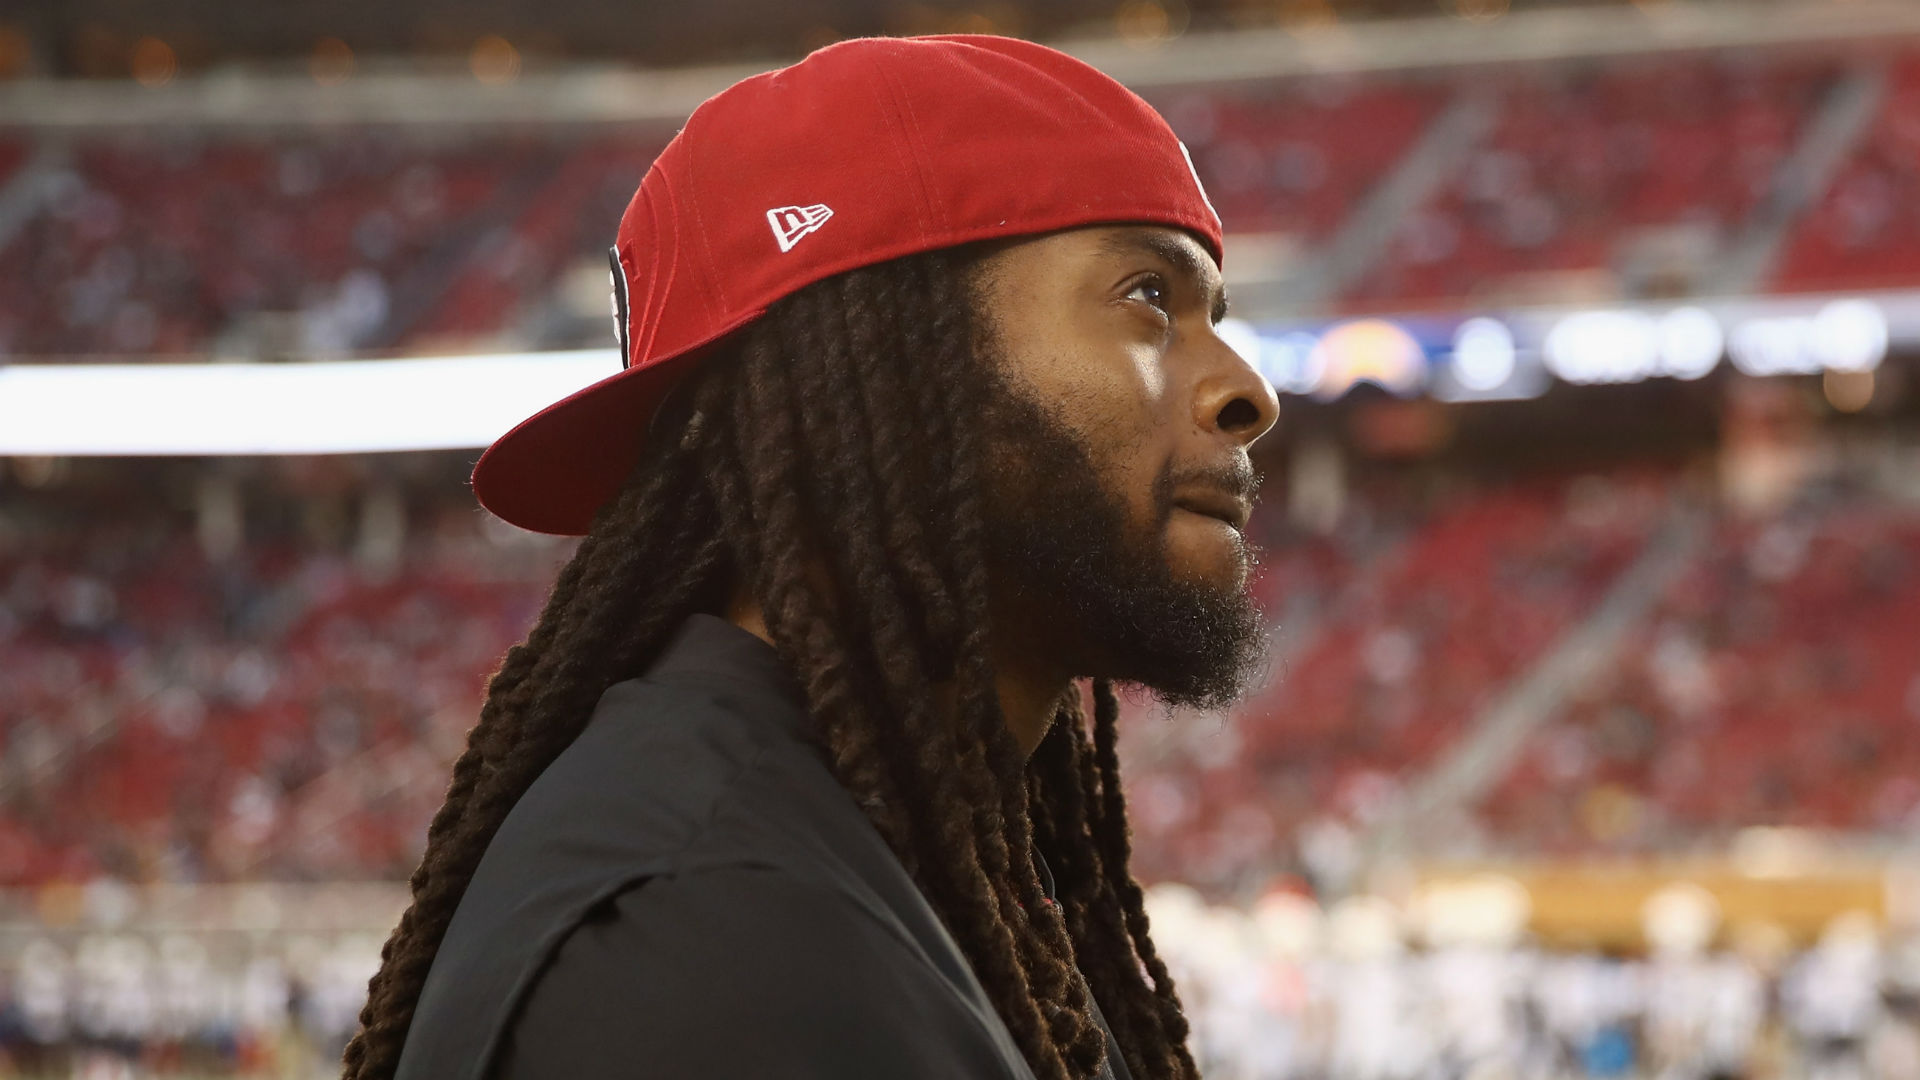 Richard Sherman injury update: 49ers CB (calf strain) out 'a few weeks,' report says